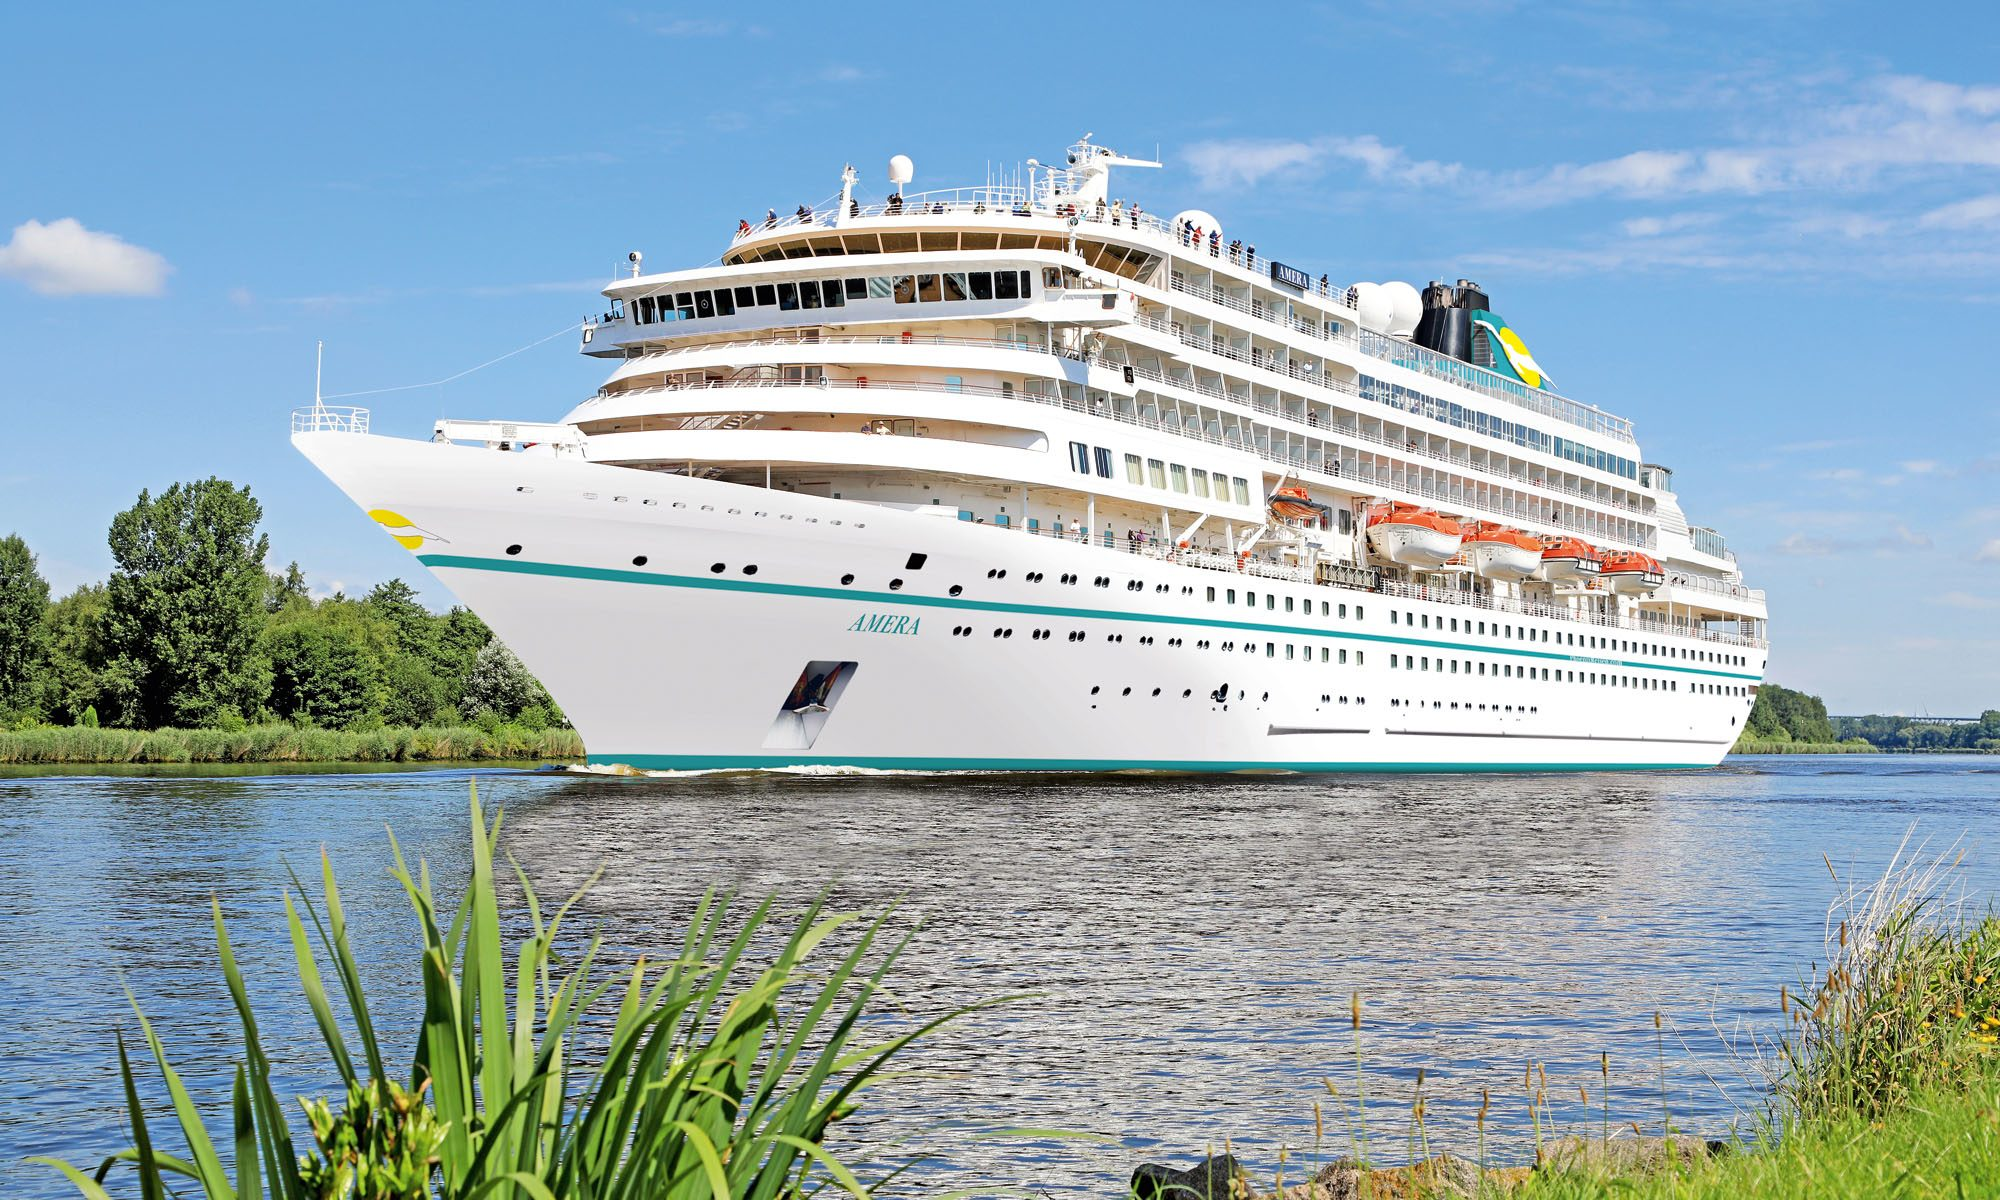 English To Italian Translator Google: Eastern Mediterranean Cruise With Amera On 06/12/2019 (AMR014